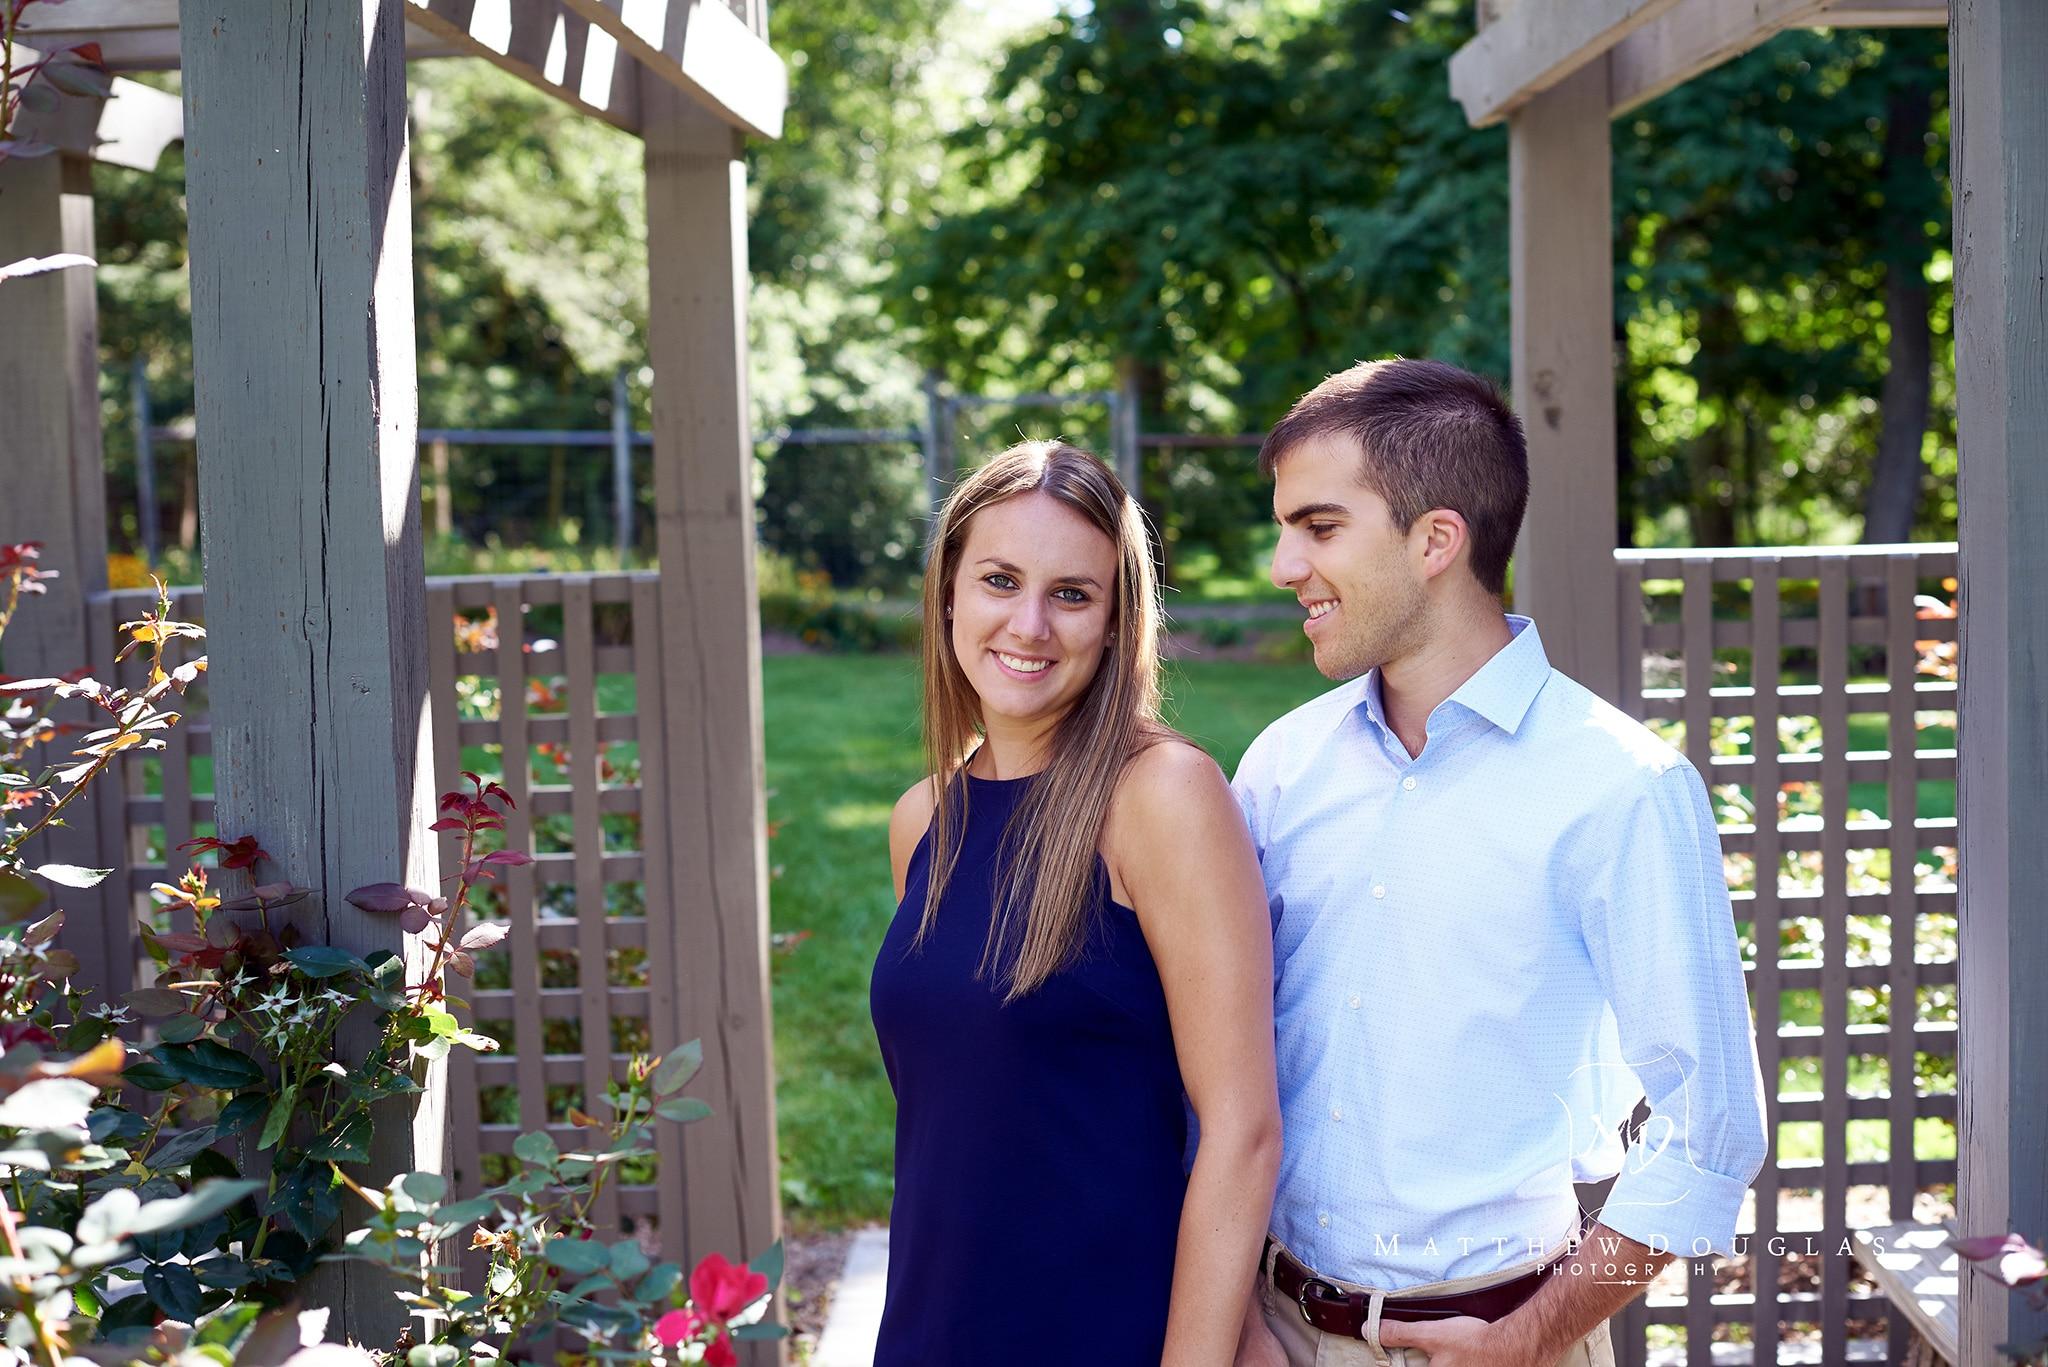 Engagement photos at the Hunterdon County Arboretum